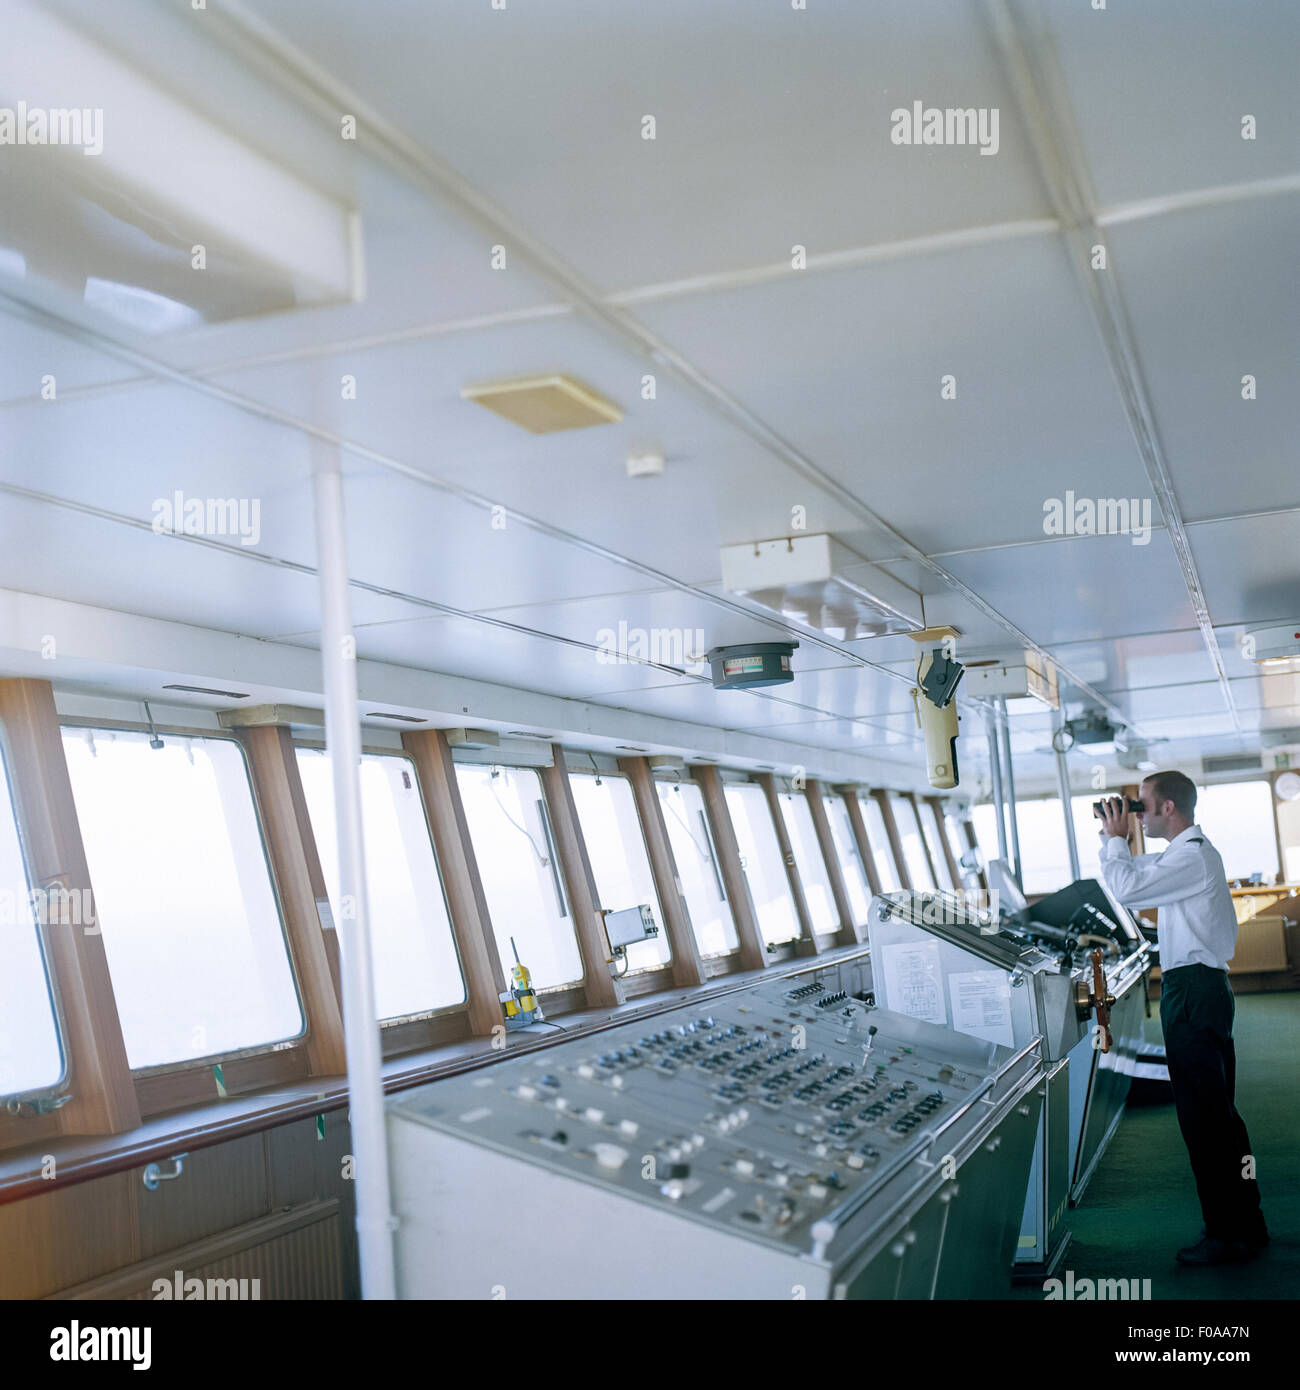 Sailor using binoculars on bridge of container ship at sea - Stock Image